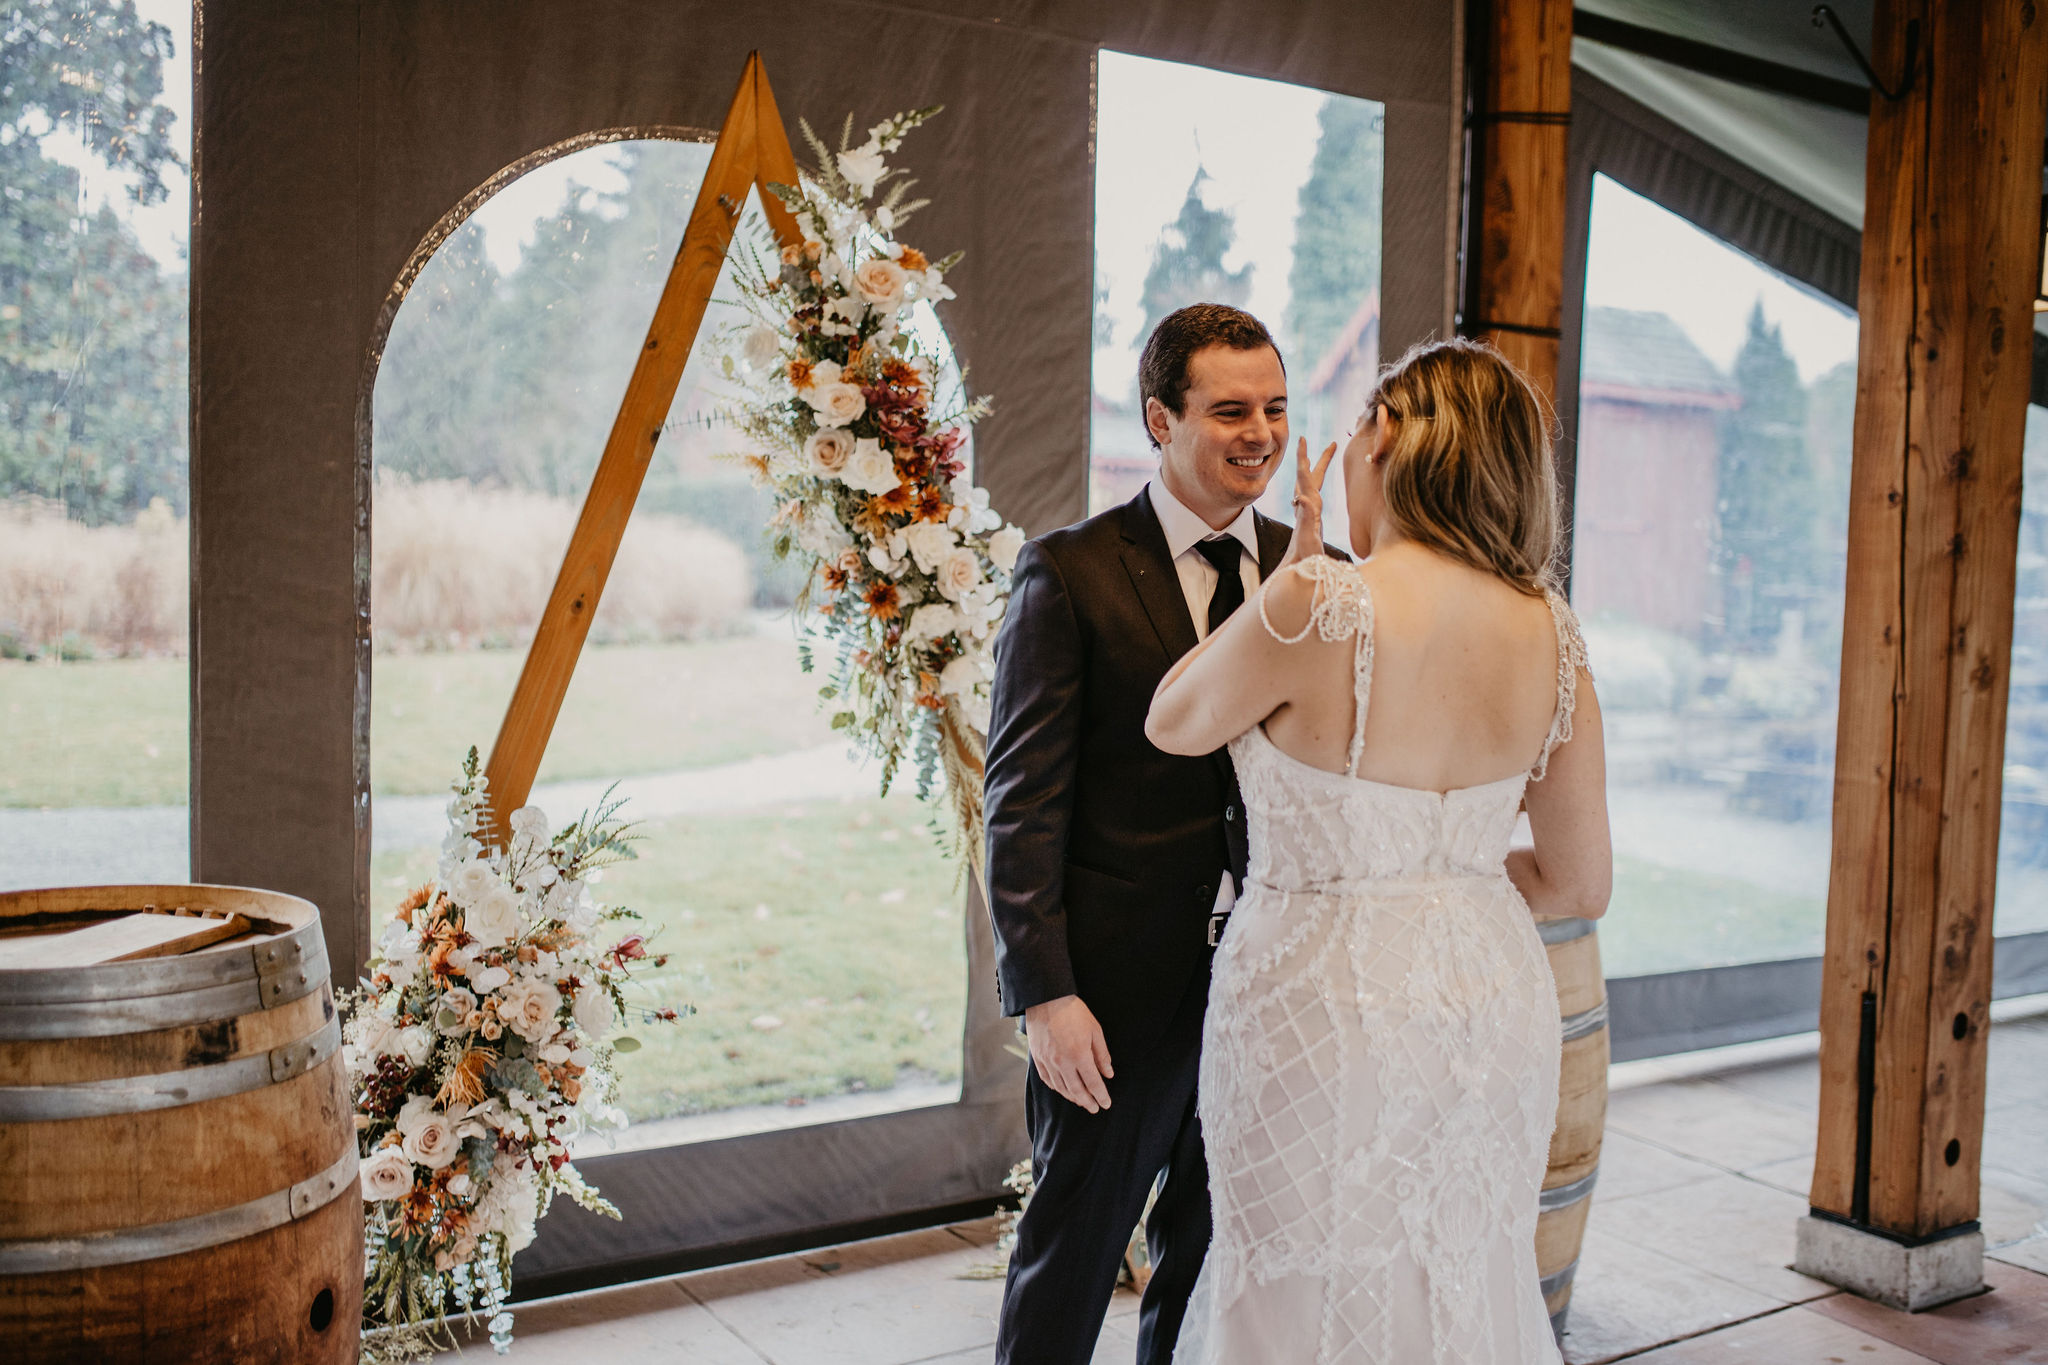 willows lodge woodinville wedding florist